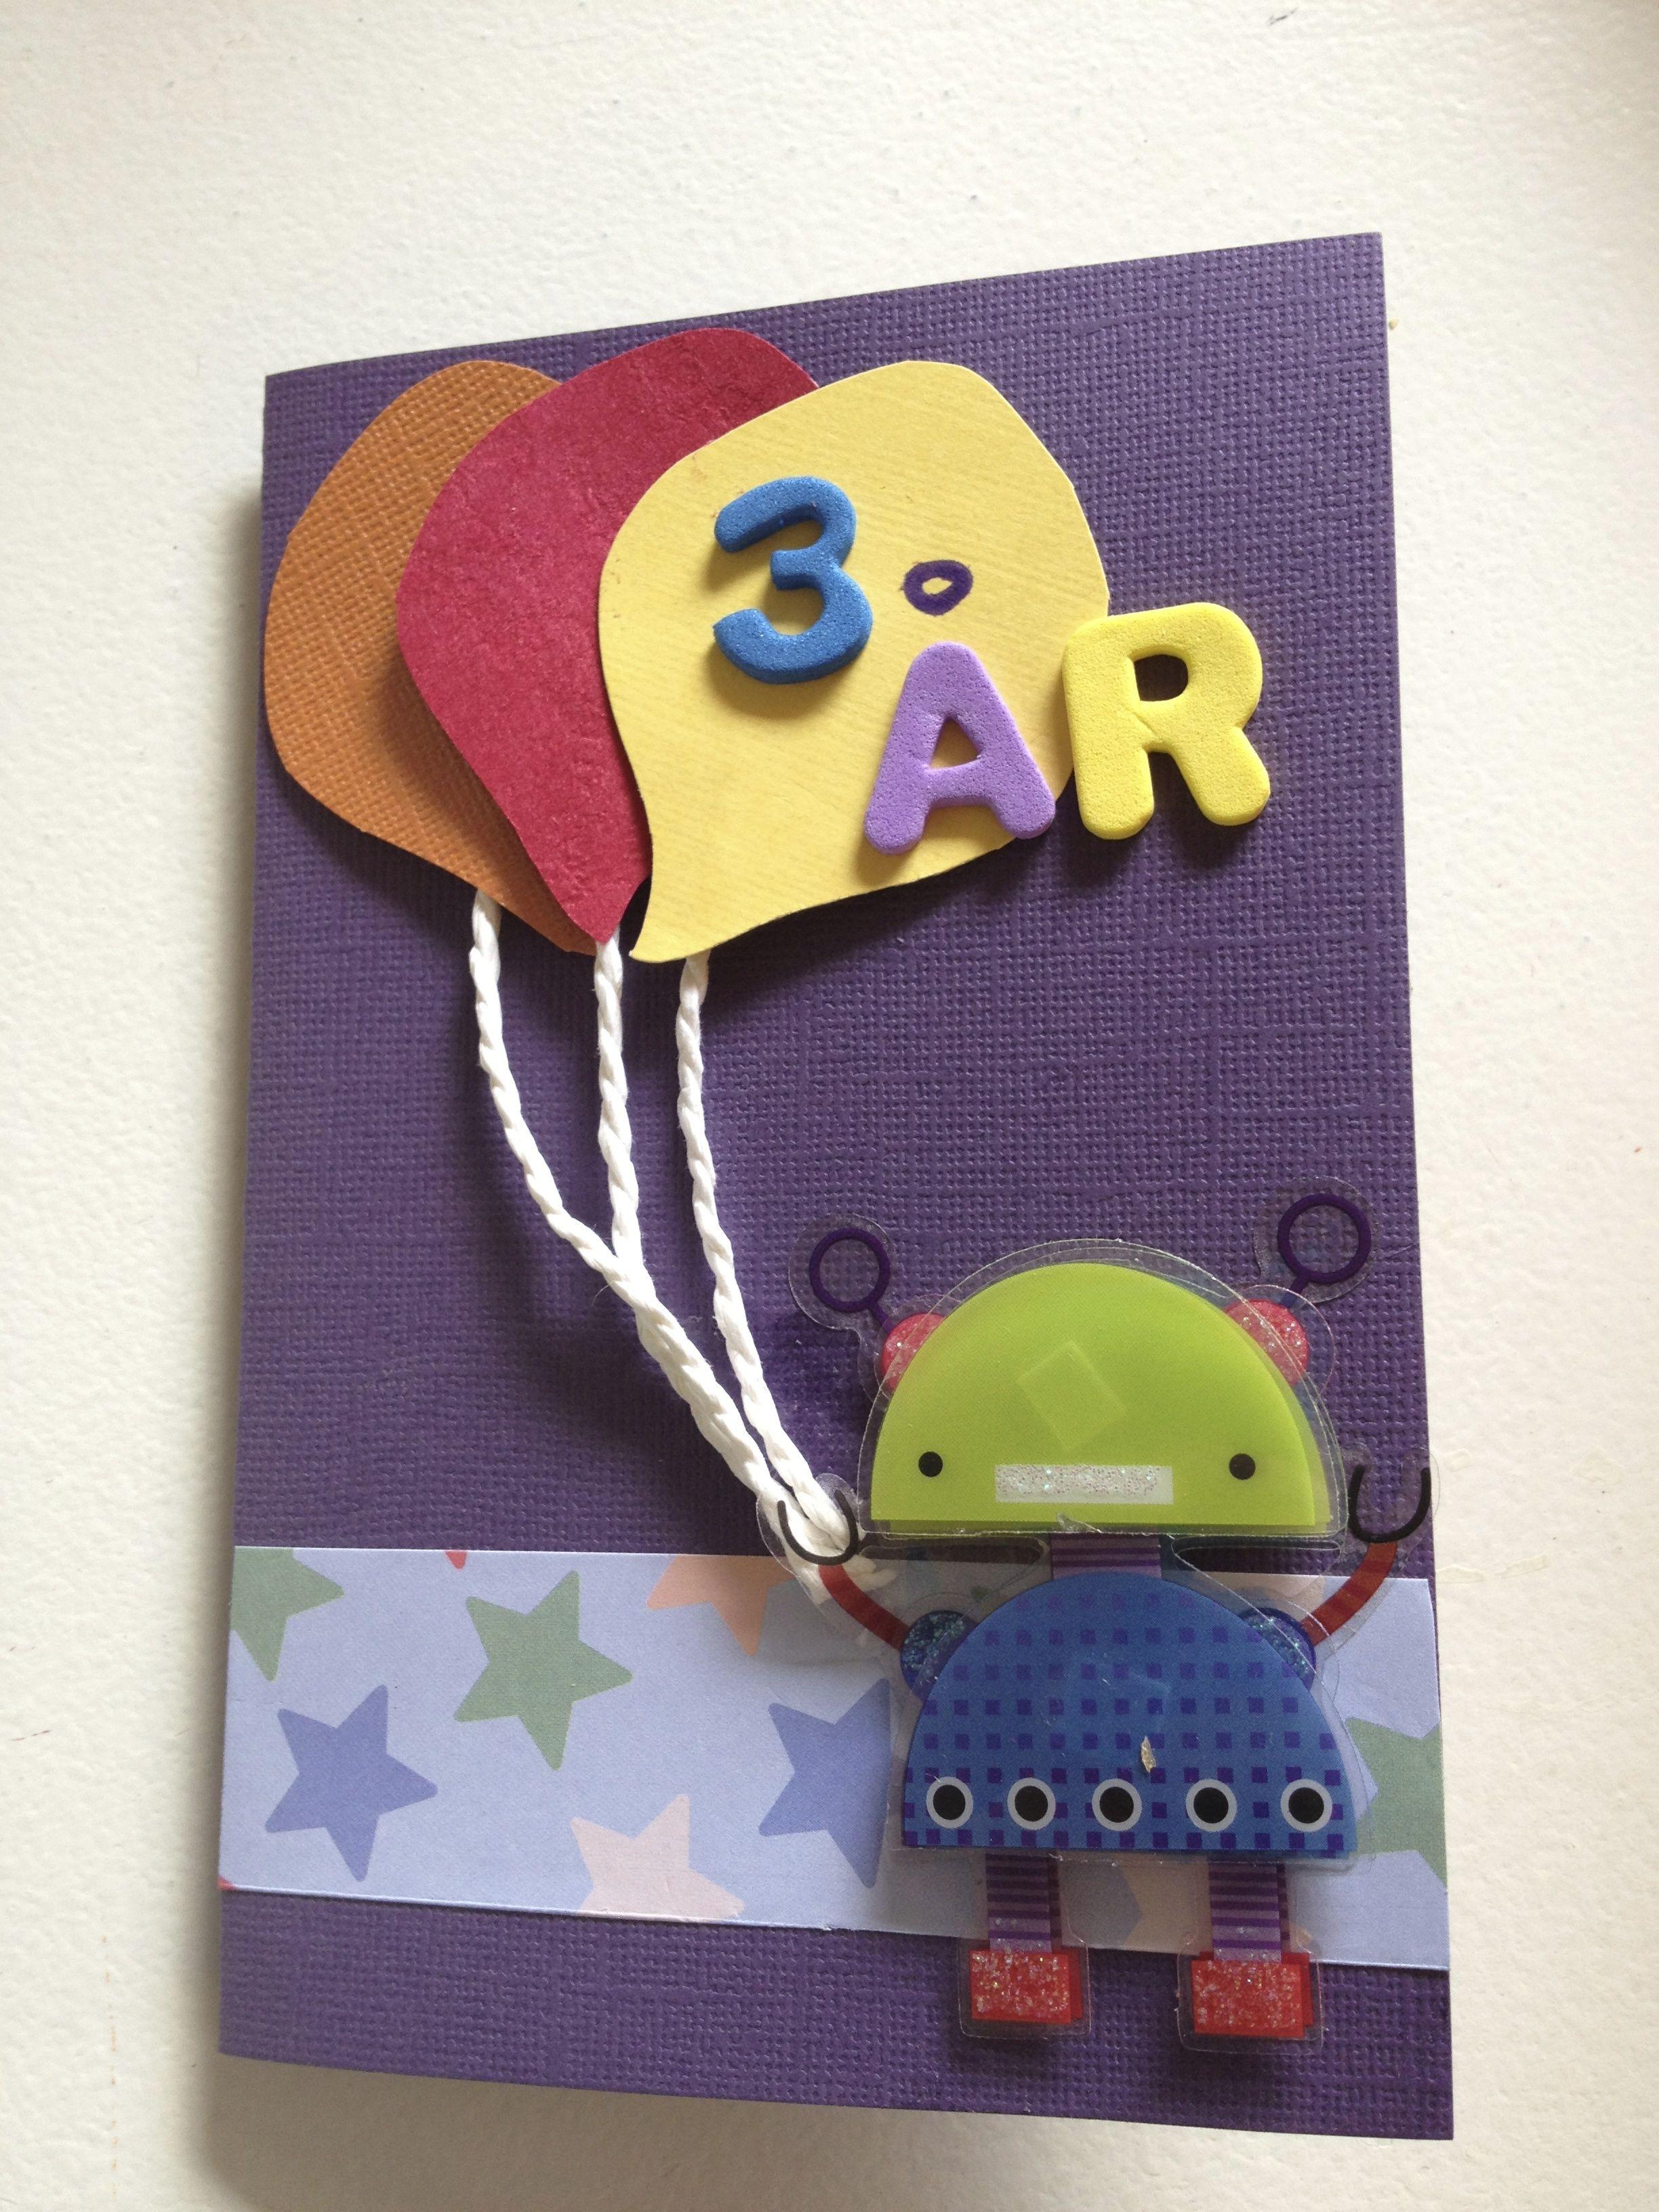 Homemade birthday card for 3 year old girl my stuff pinterest homemade birthday card for 3 year old girl kristyandbryce Choice Image